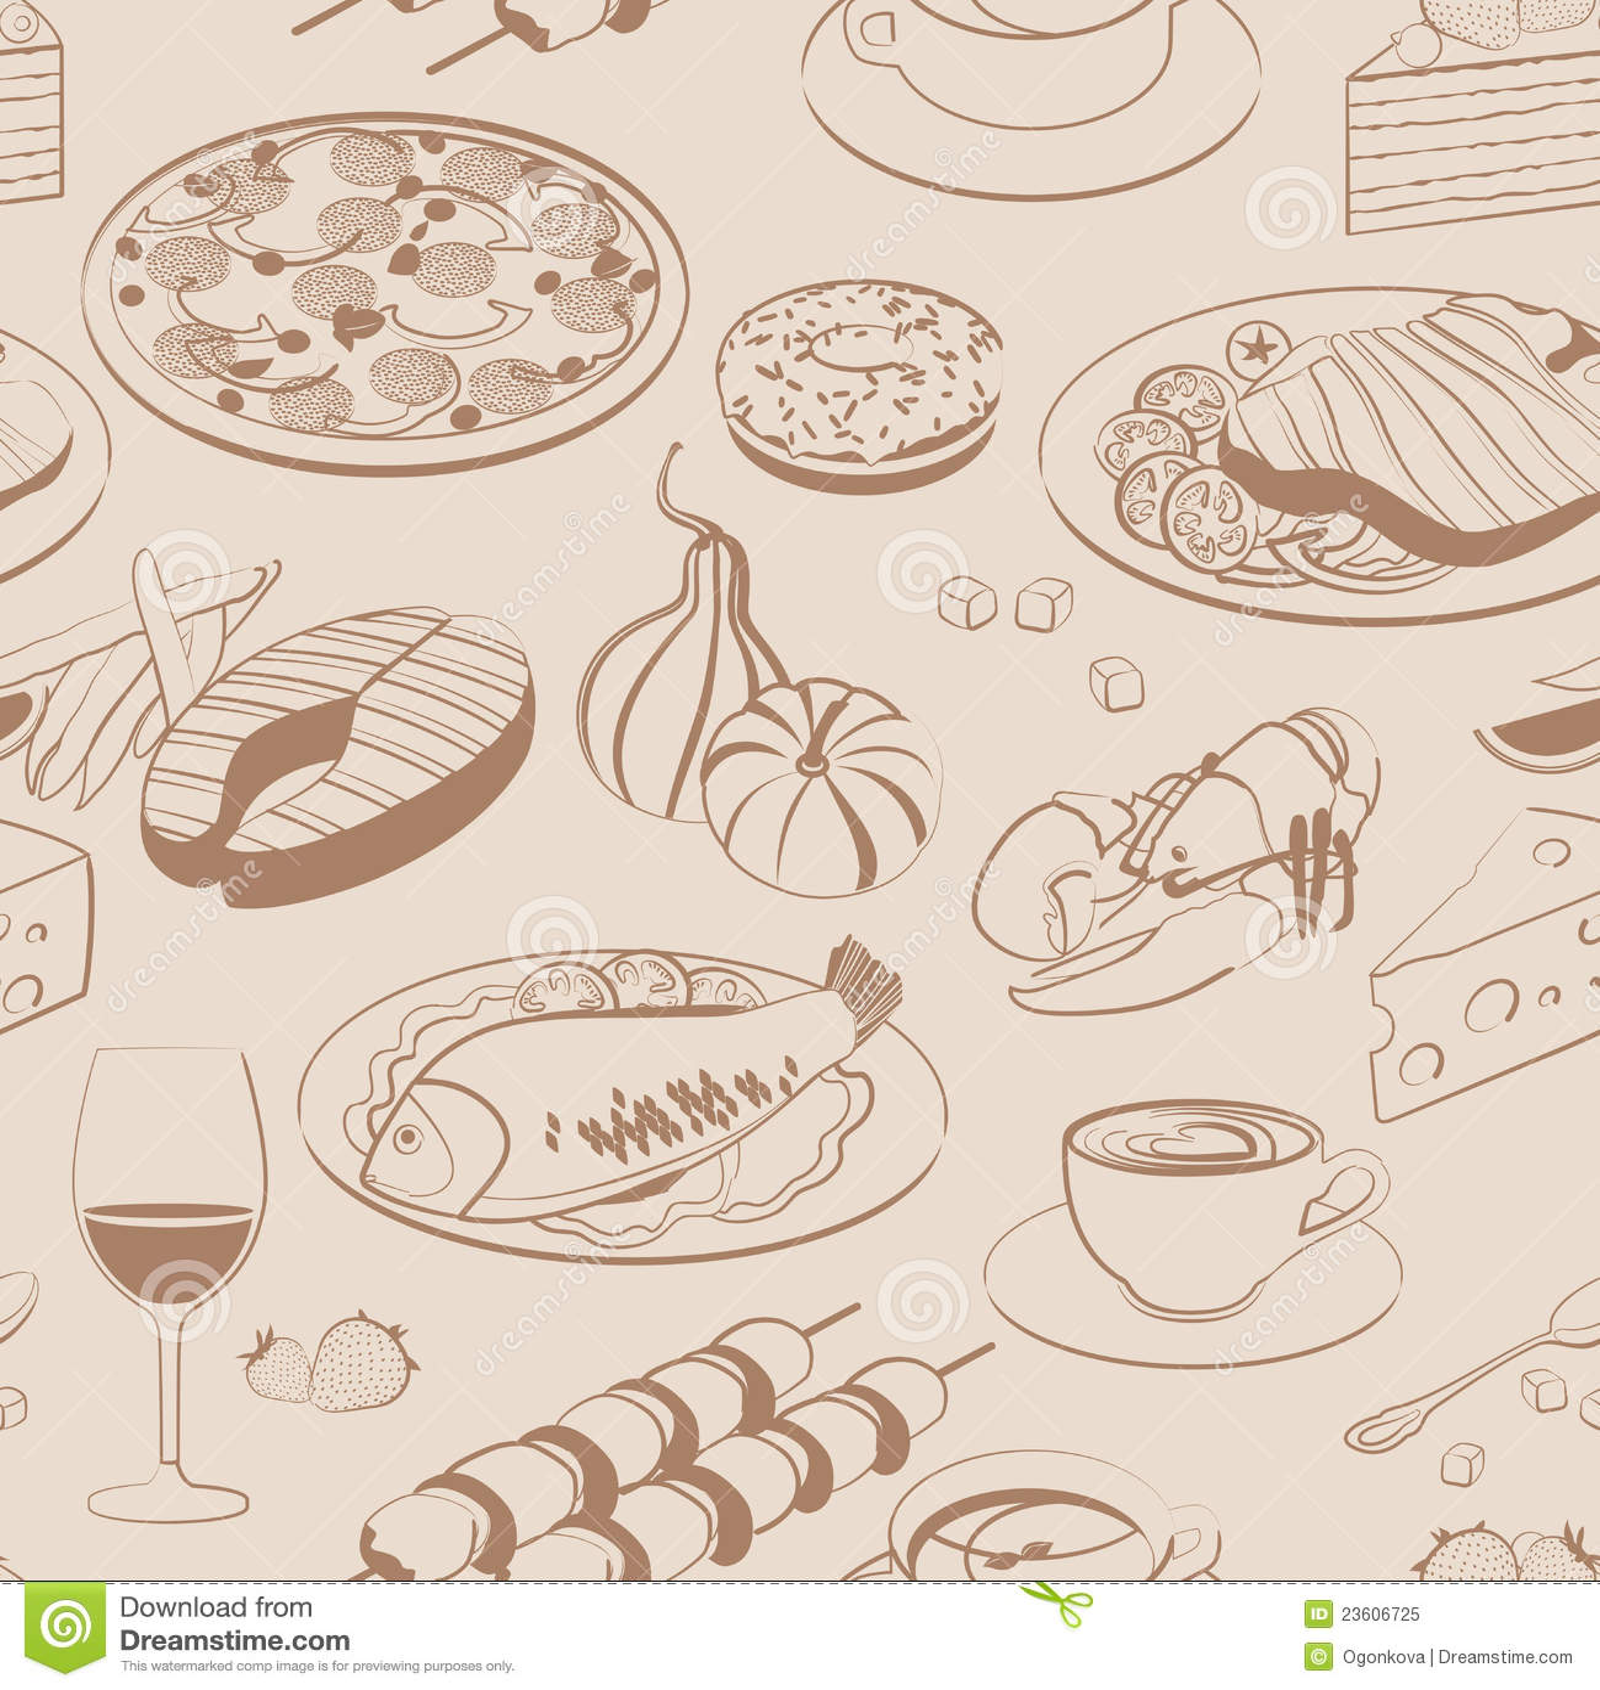 Seamless pattern of food